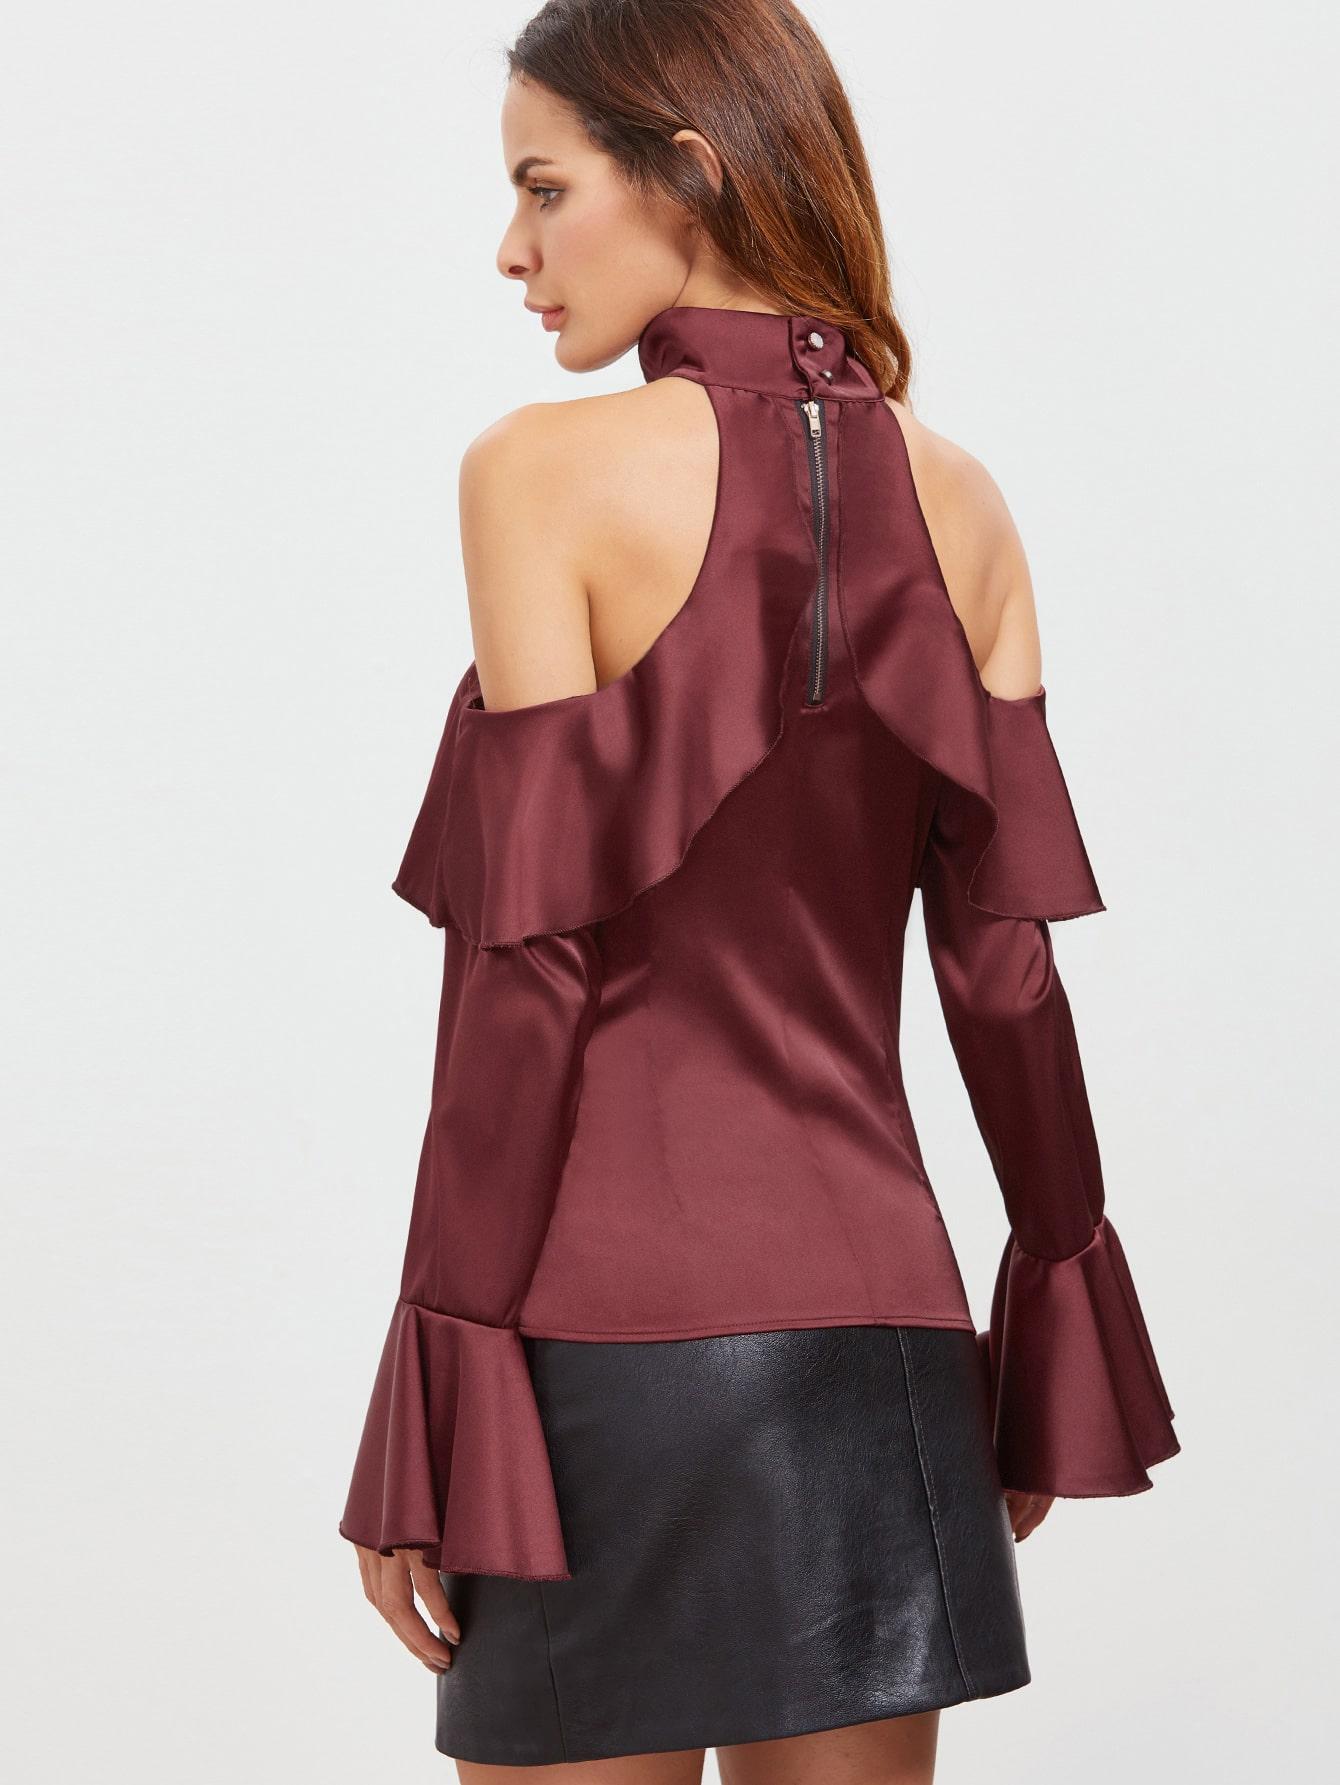 blouse161013701_2